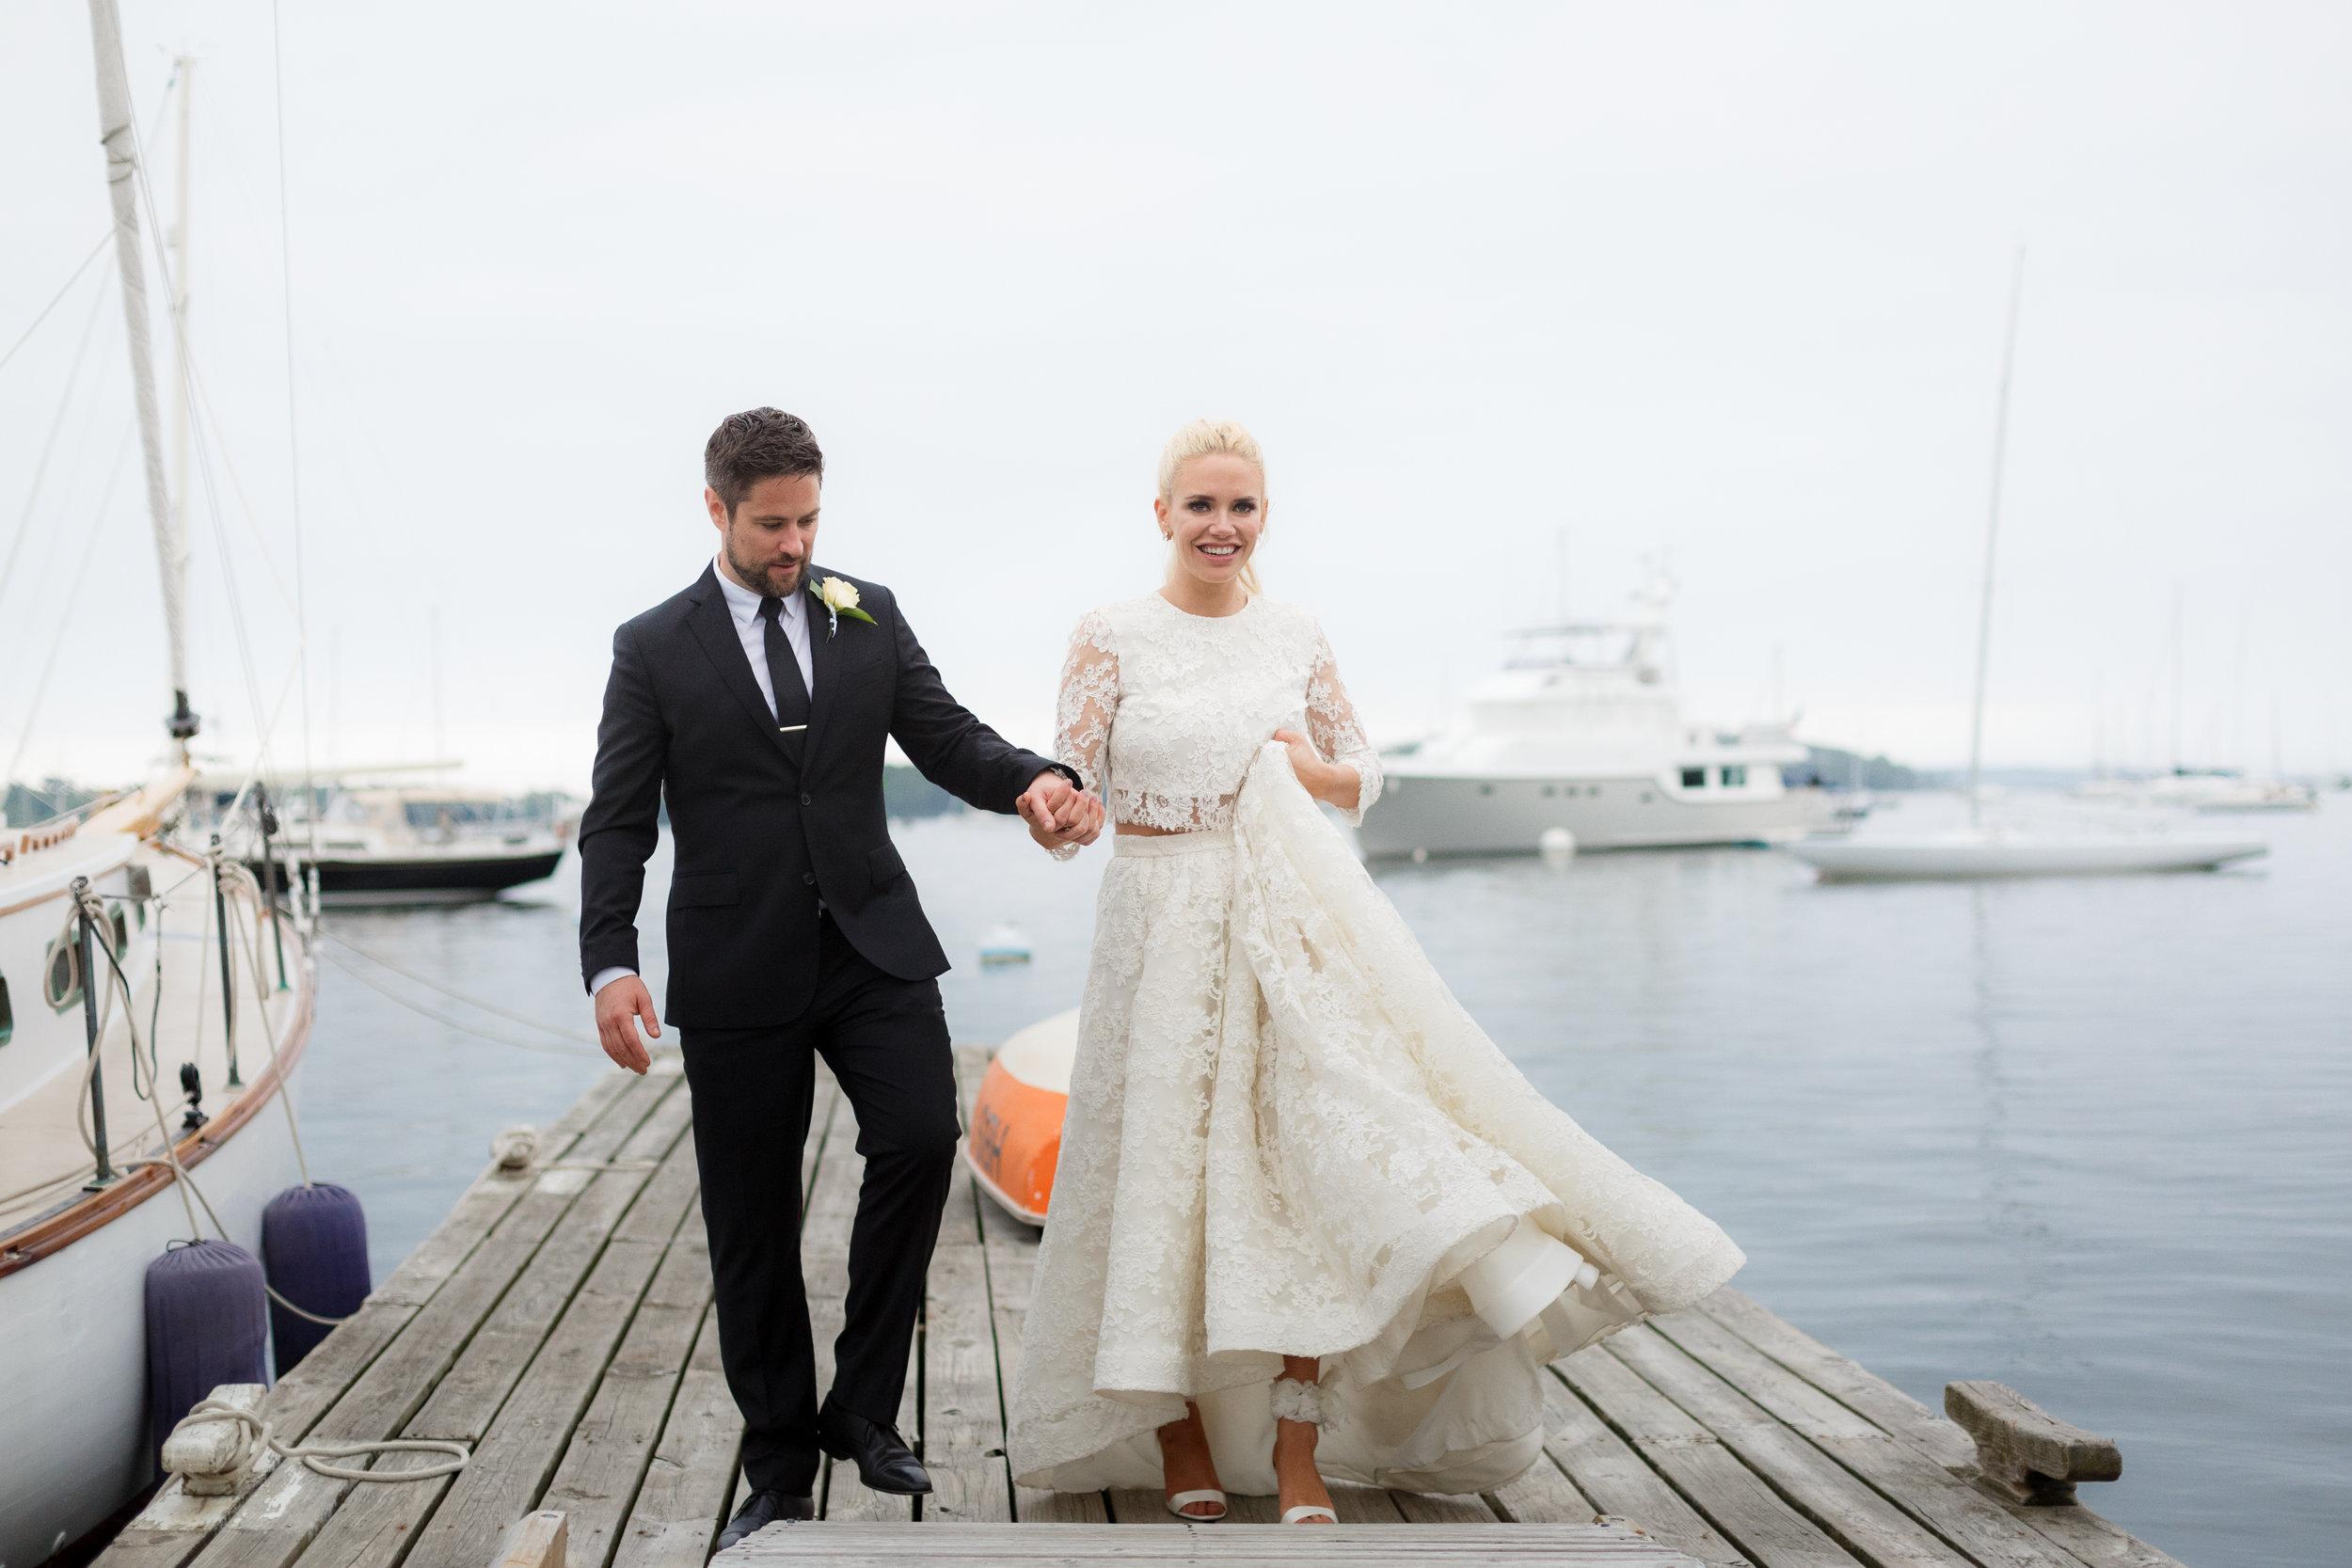 formal_seaside_summer_wedding_dockside_grill_falmouth_maine_wedding_photographer_whitney_j_fox_8884.jpg